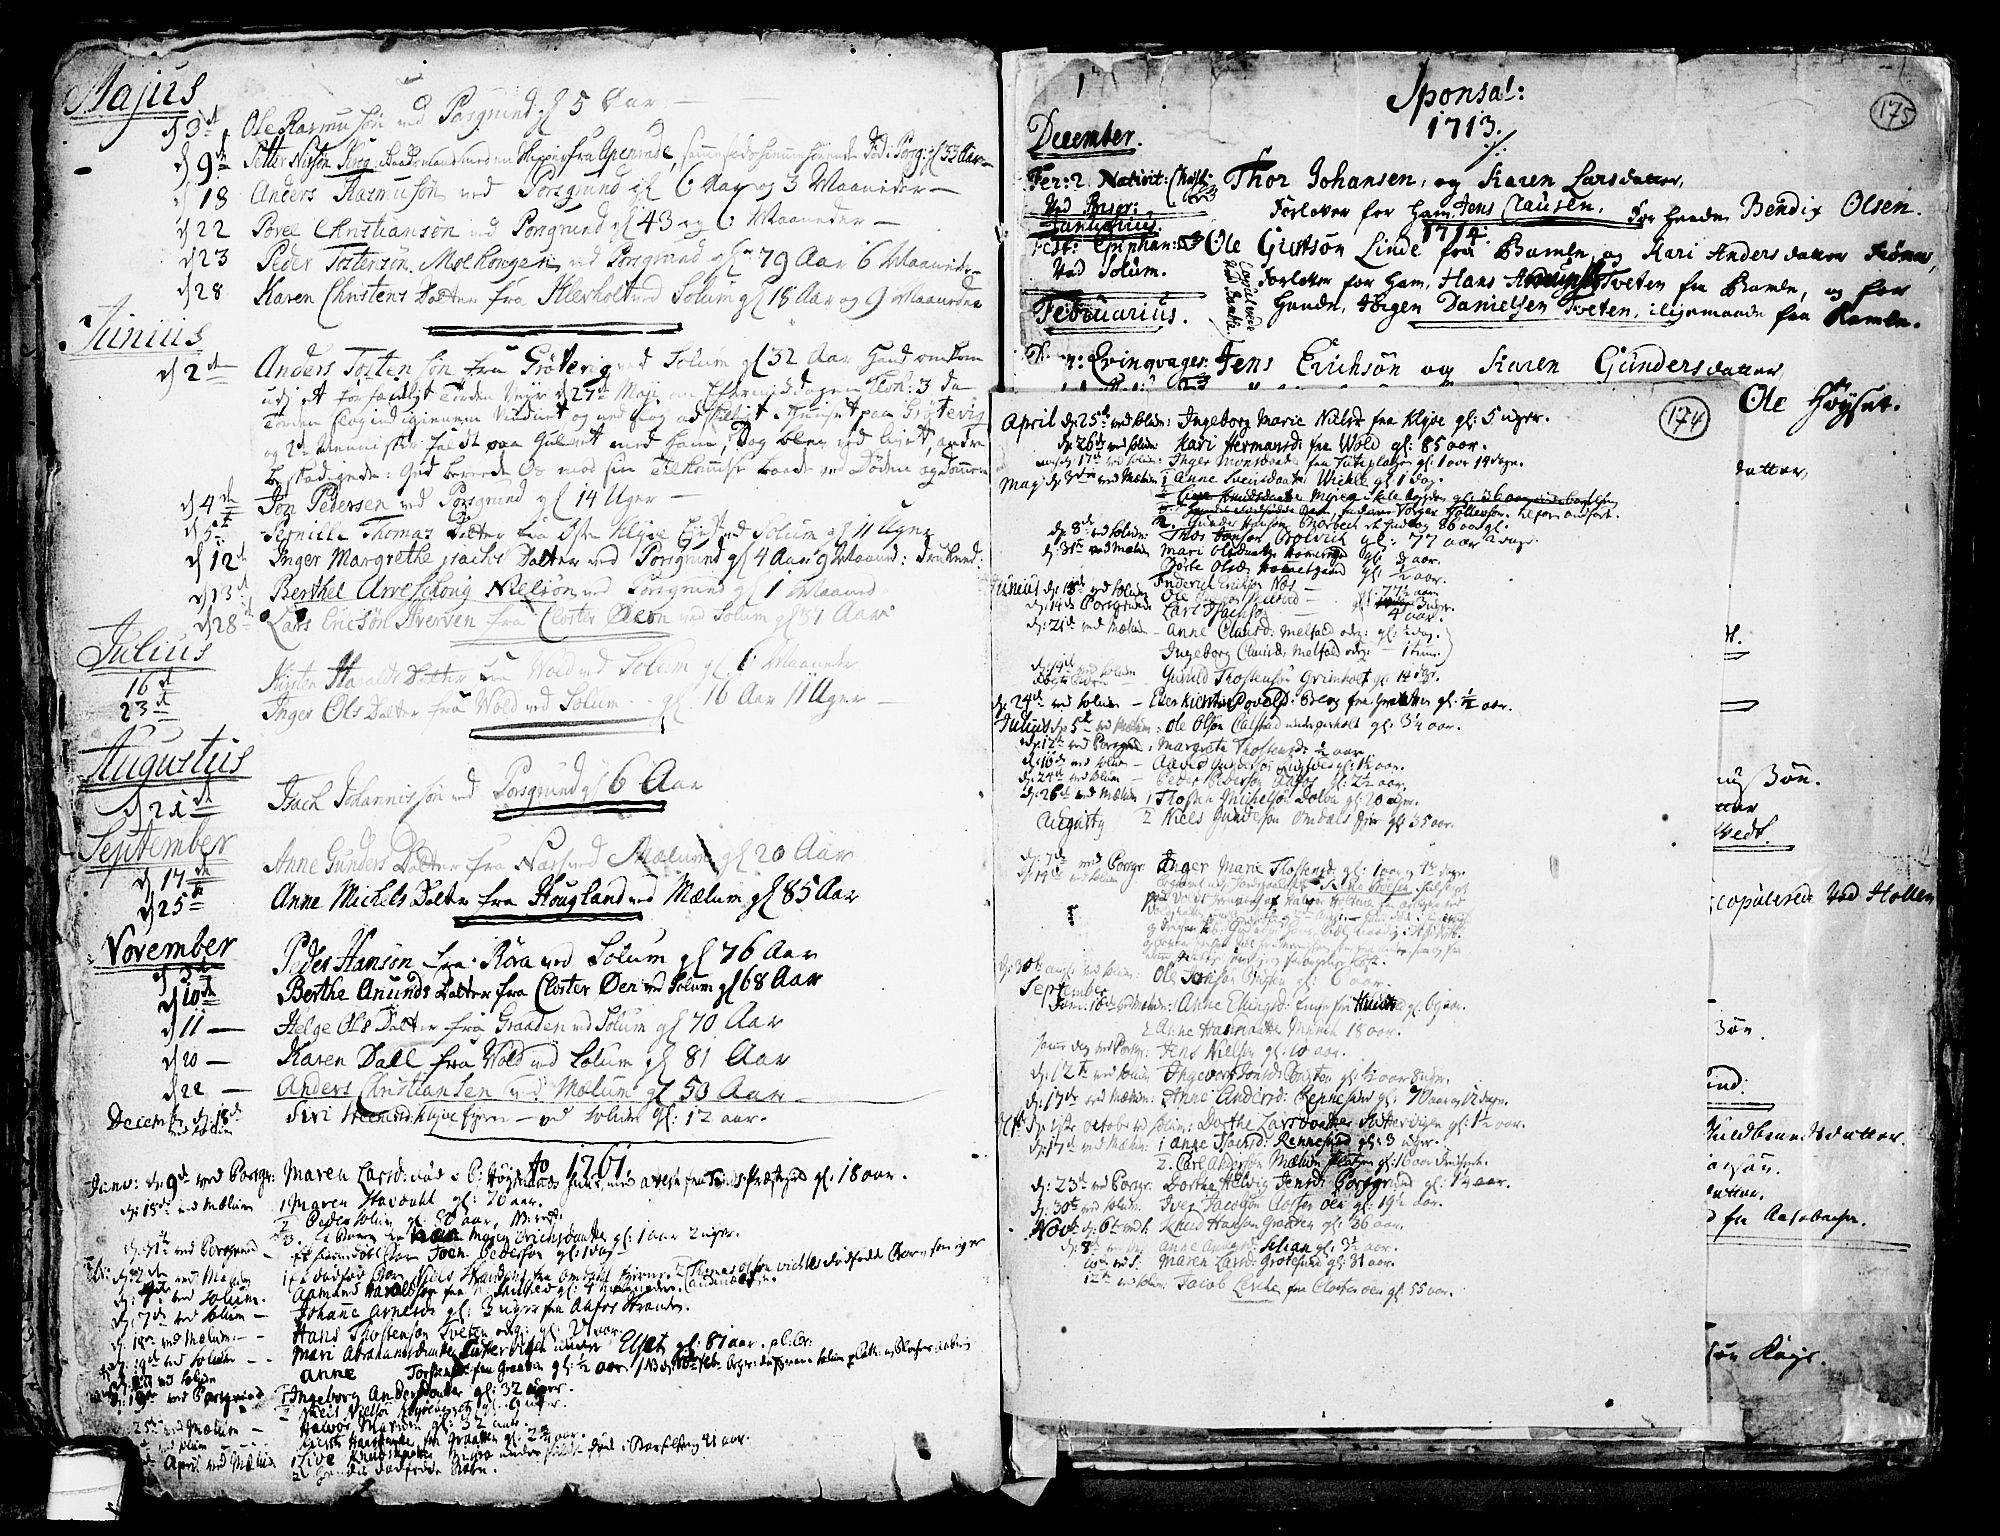 SAKO, Solum kirkebøker, F/Fa/L0002: Ministerialbok nr. I 2, 1713-1761, s. 174